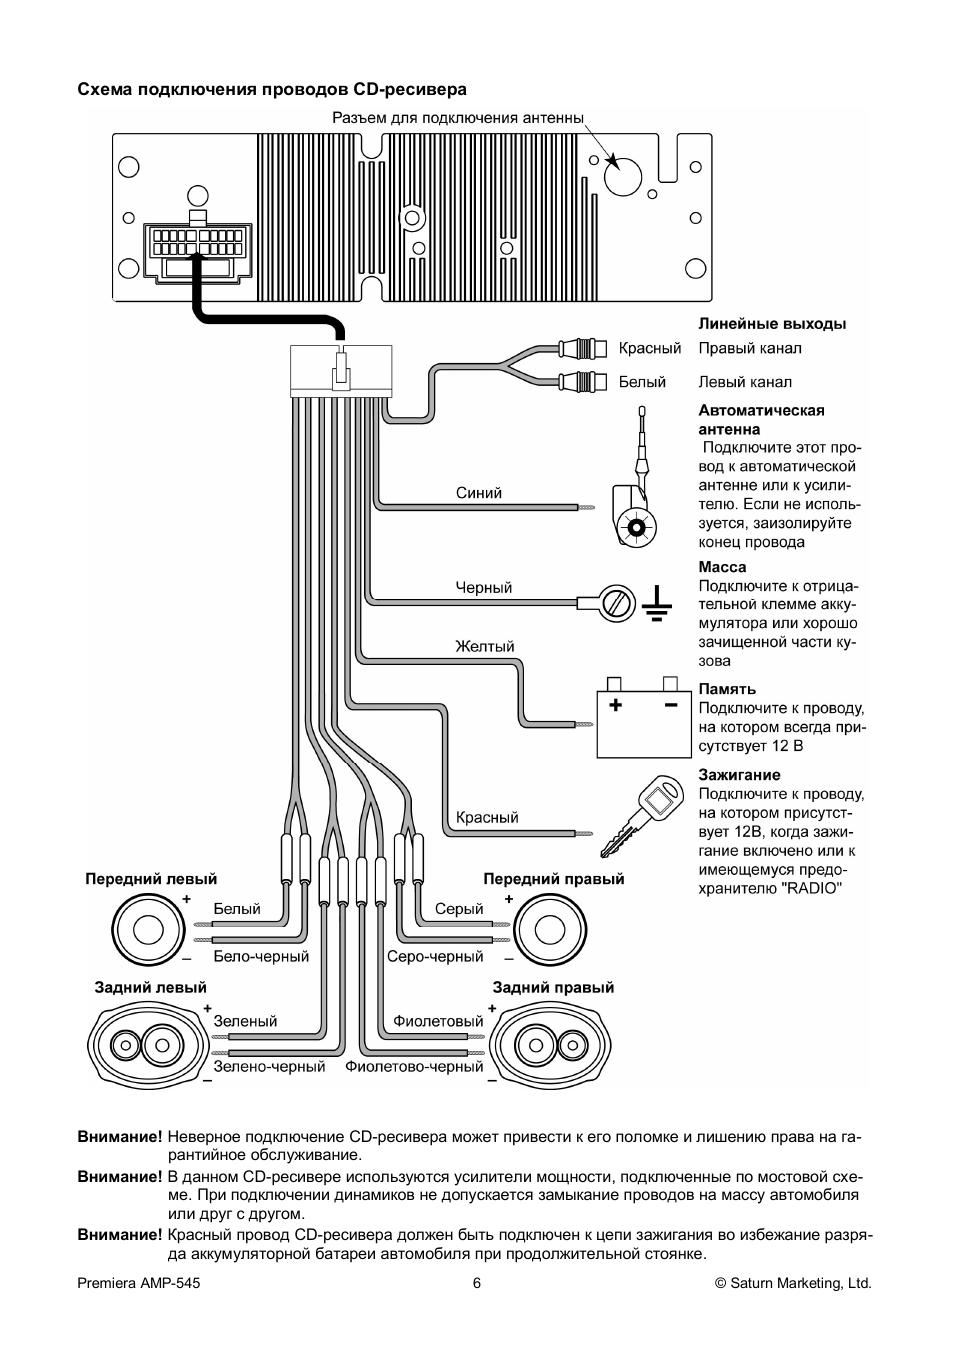 Premiera amp 540 схема